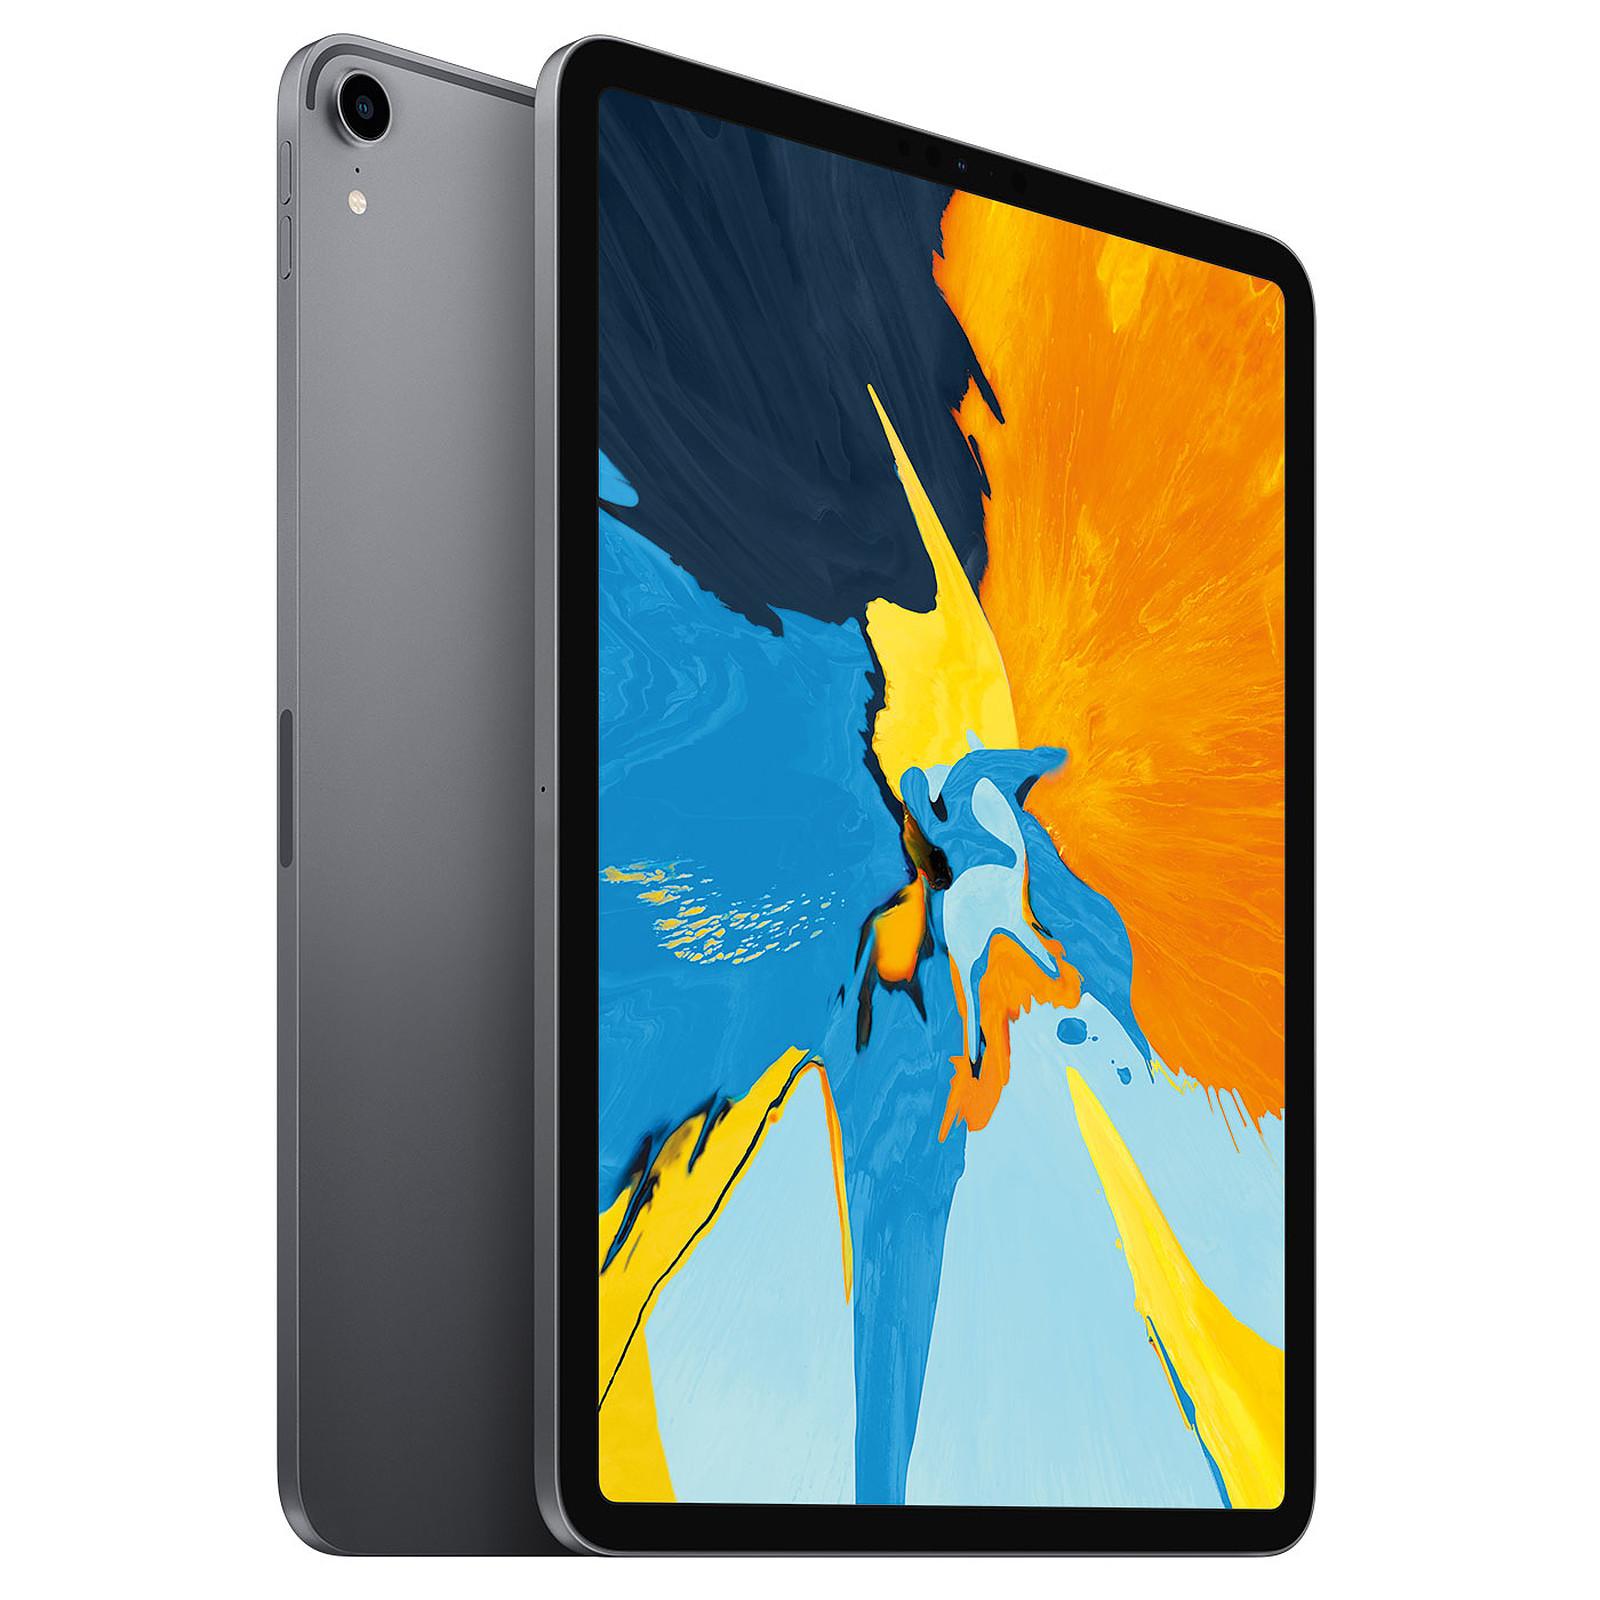 Apple iPad Pro 11-inch Wi-Fi + LTE 256GB Space Gray (2018)